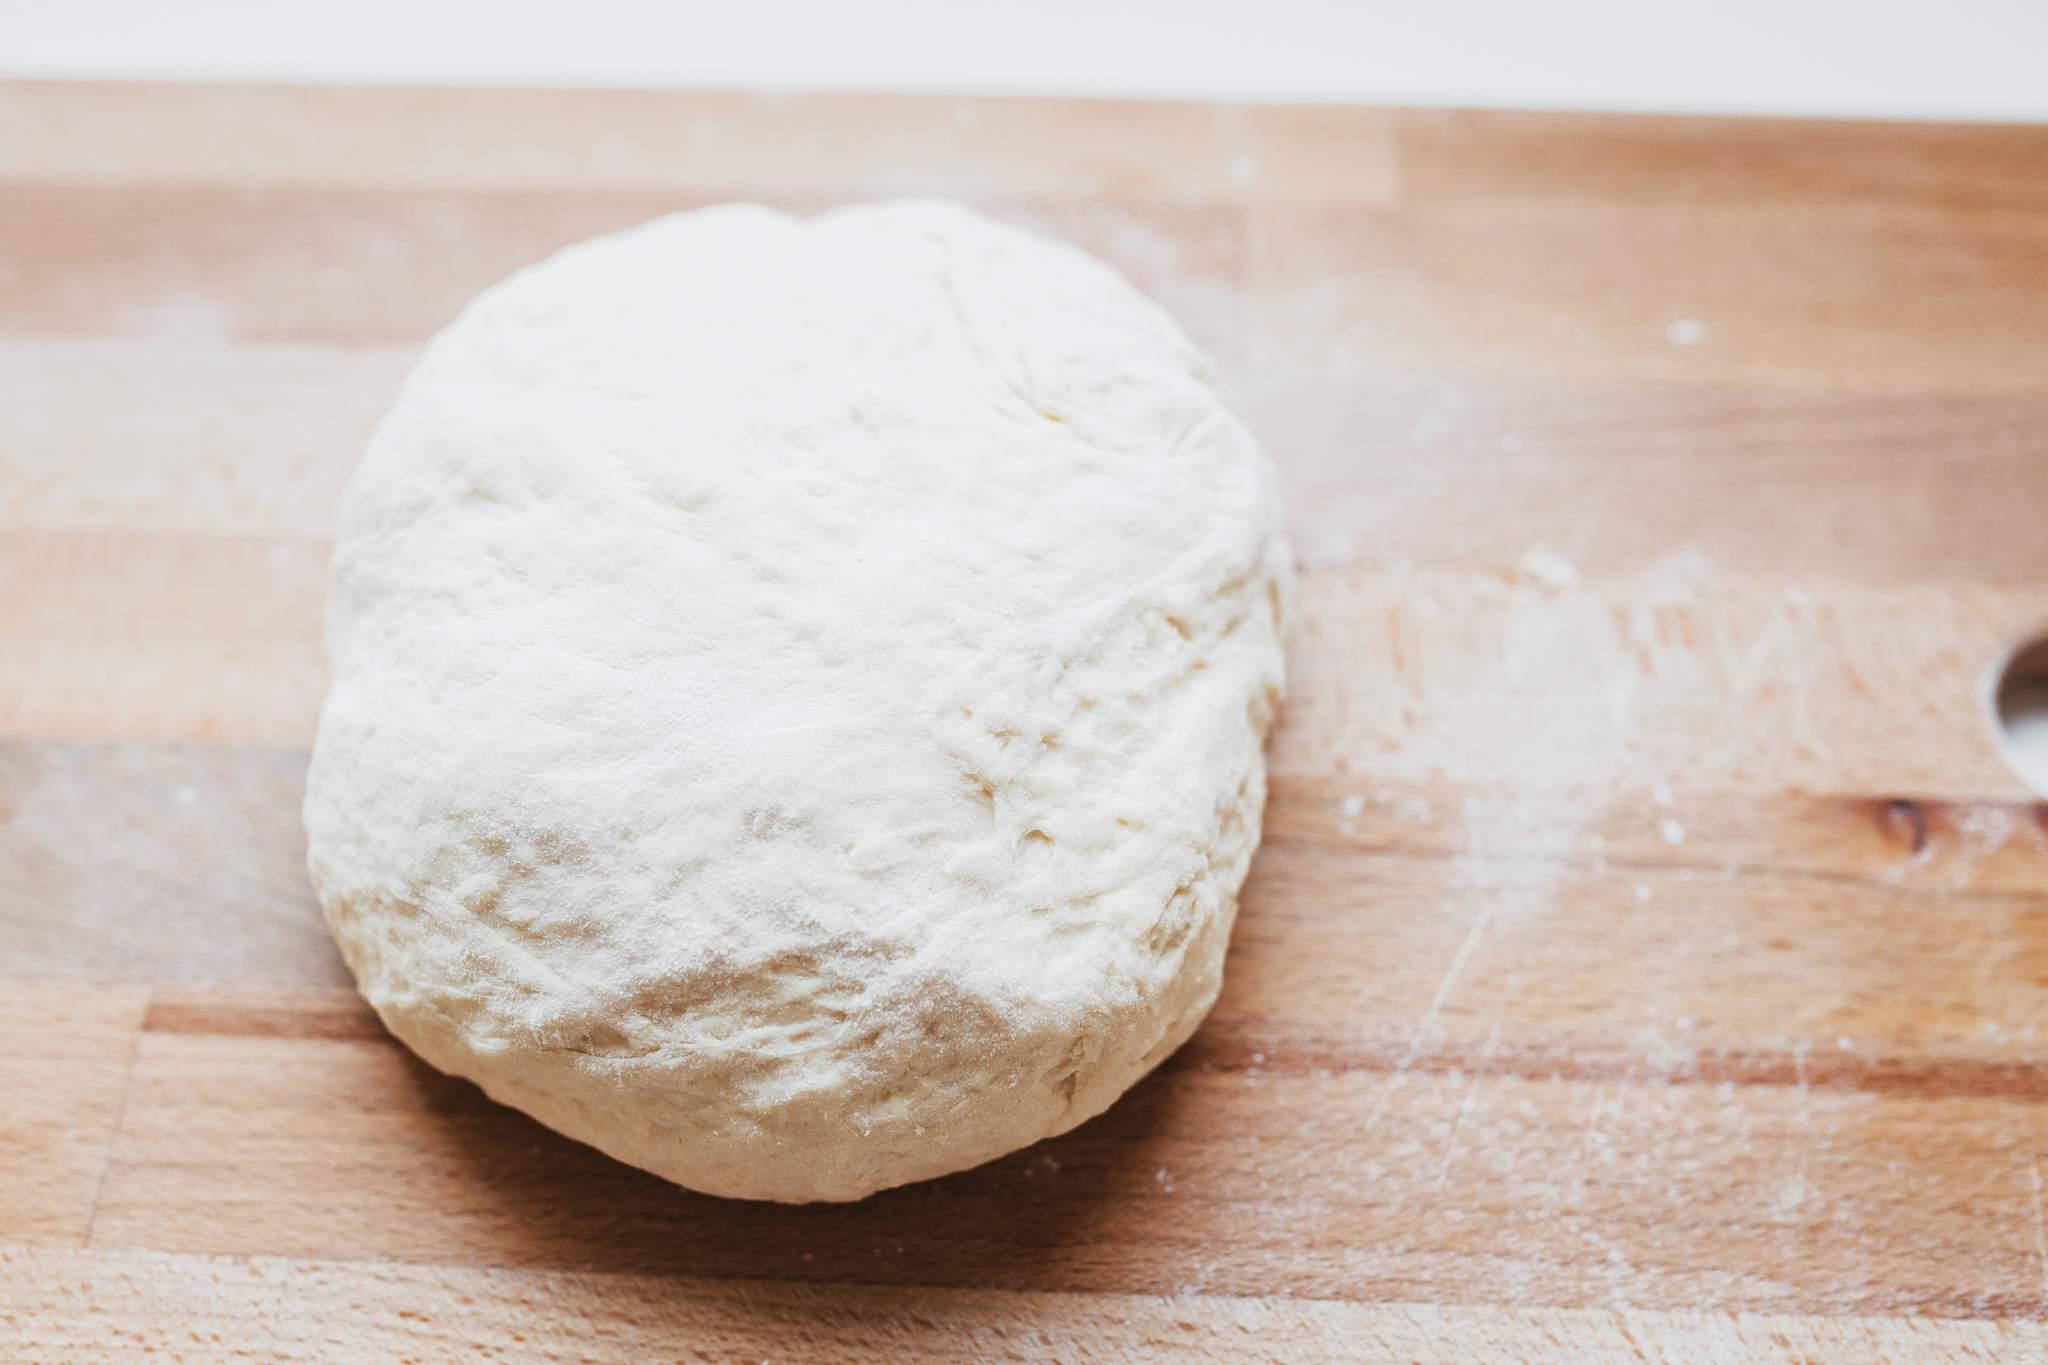 Turn the dough on a lightly floured surface